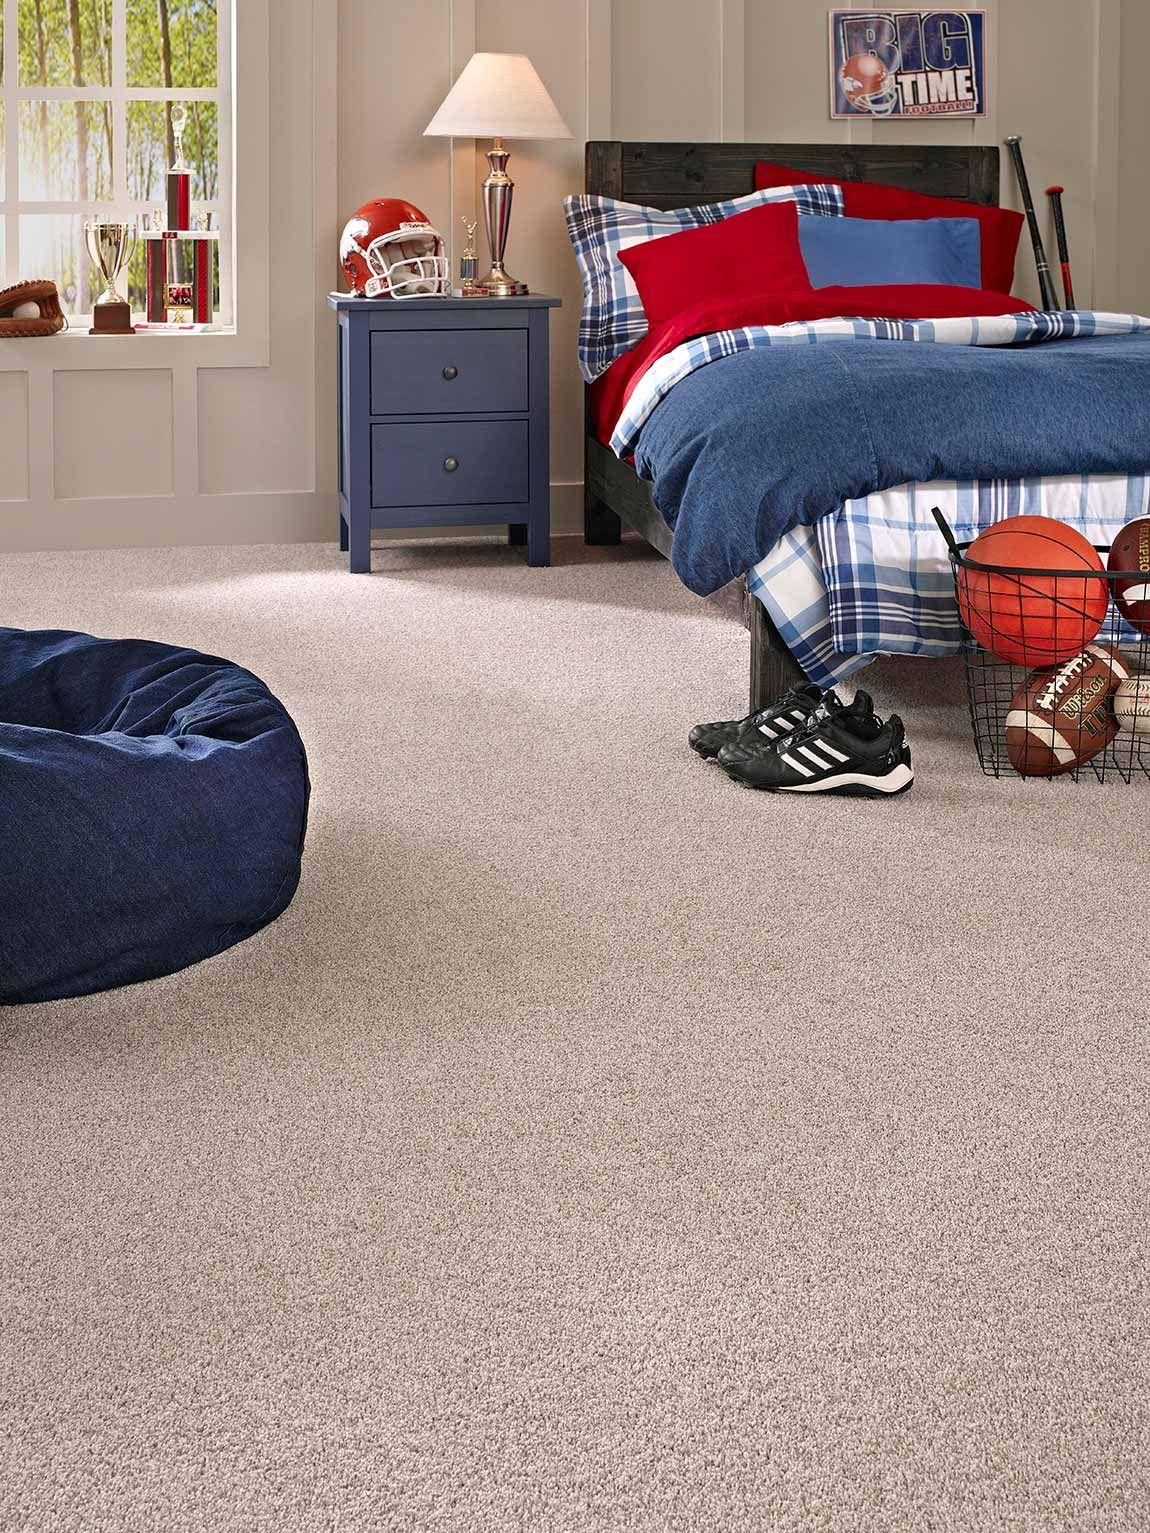 Find Top Name Carpet Brands At Great Southeast Flooring America In 2020 Carpet Brands Dreamy Bedroom Inspiration Virtual Room Designer